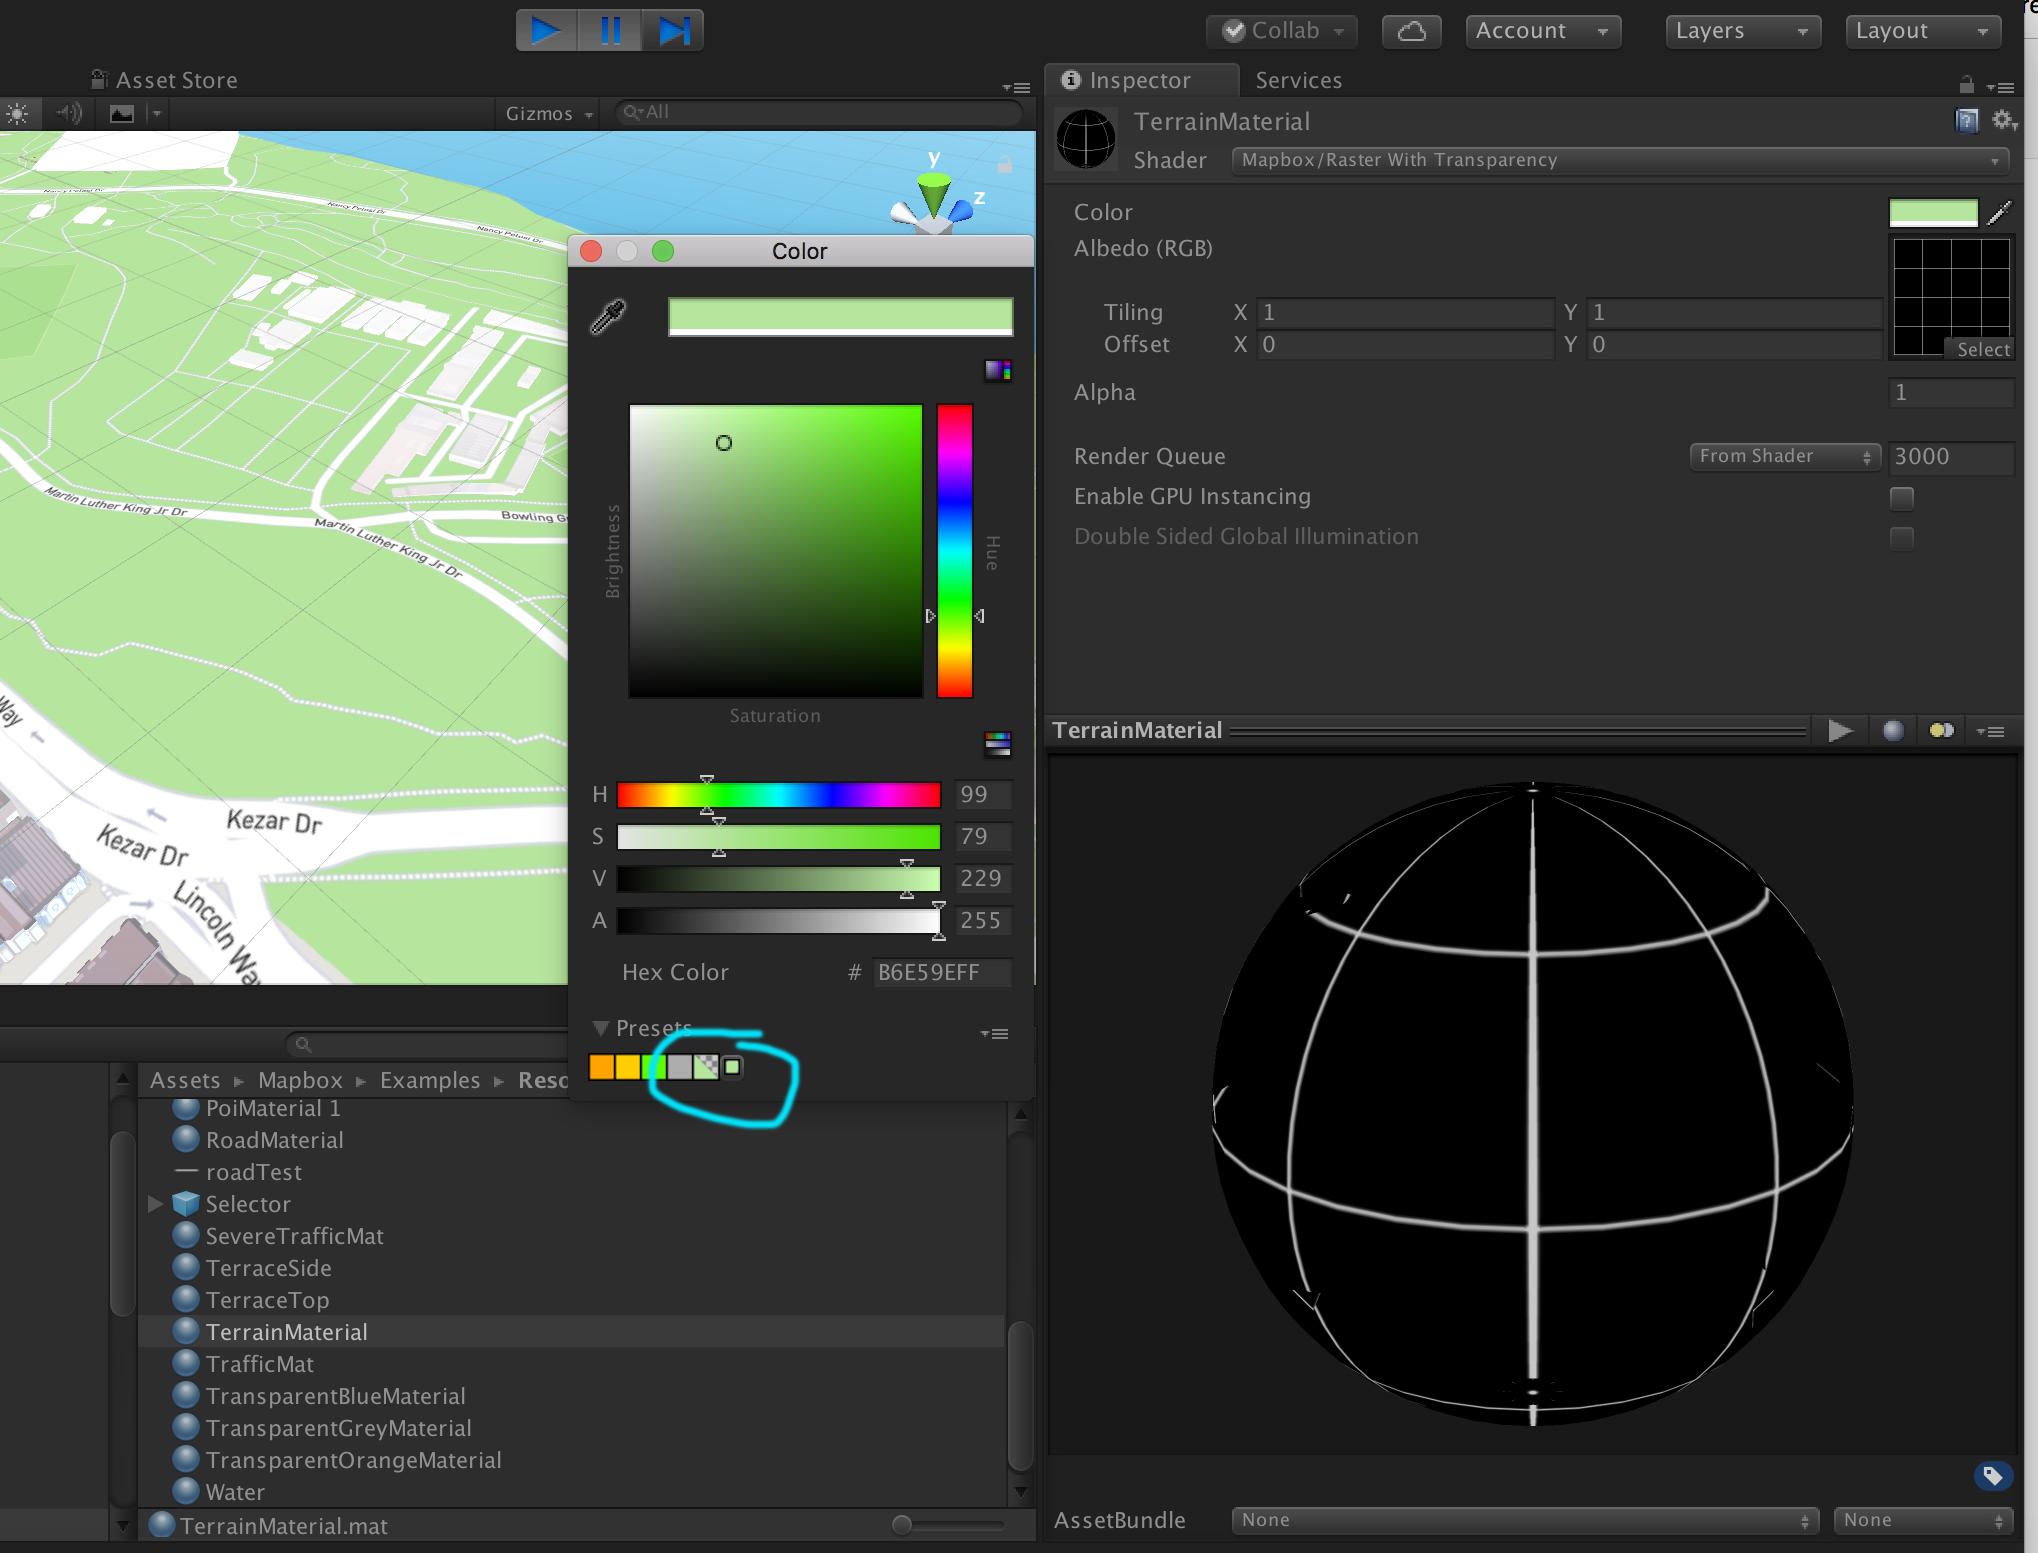 Transparent background surface · Issue #596 · mapbox/mapbox